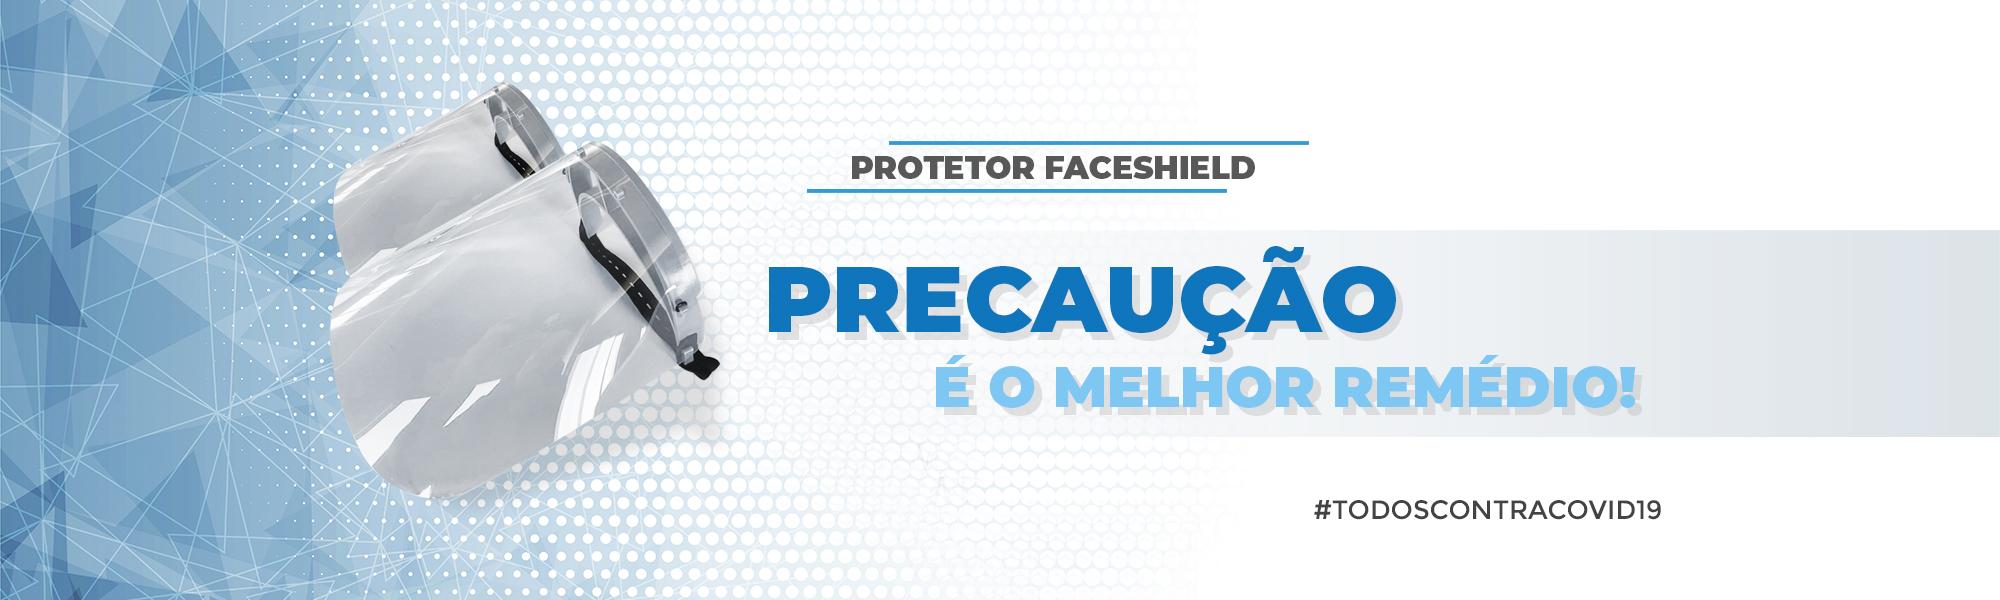 Protetor Faceshield